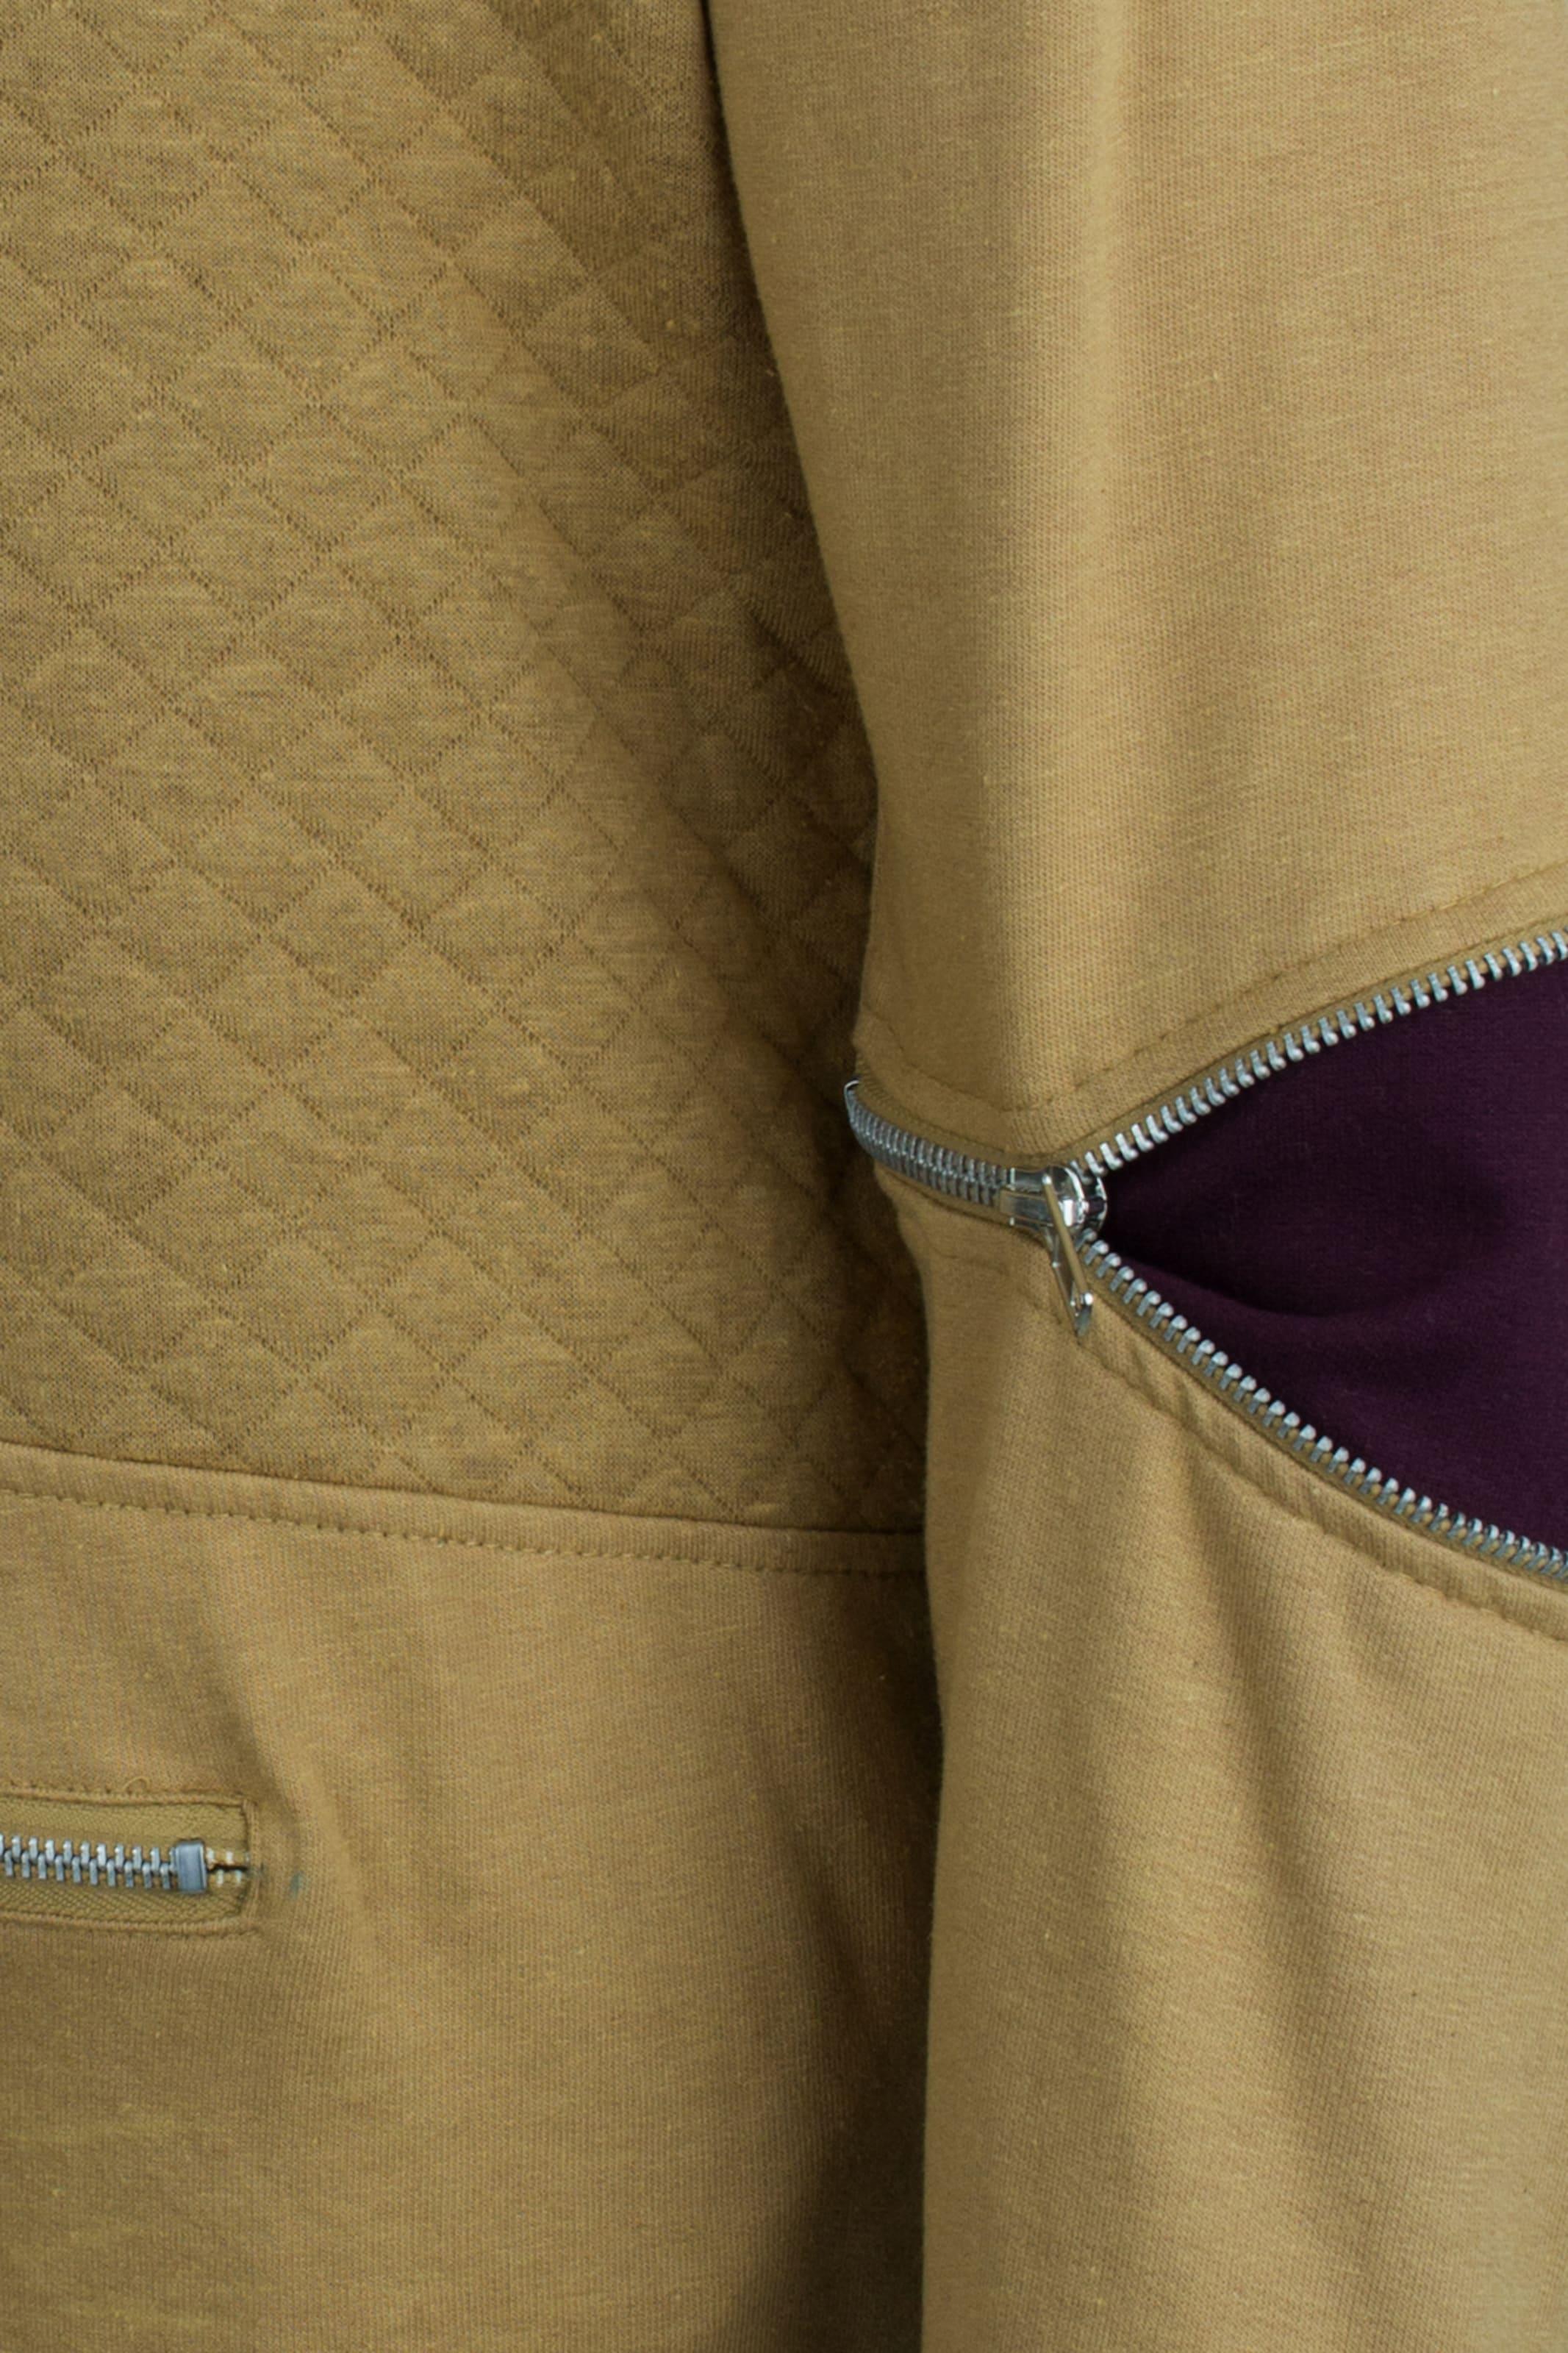 EcruSchwarz Pullover In In Soulstar Soulstar Pullover UMzVpS